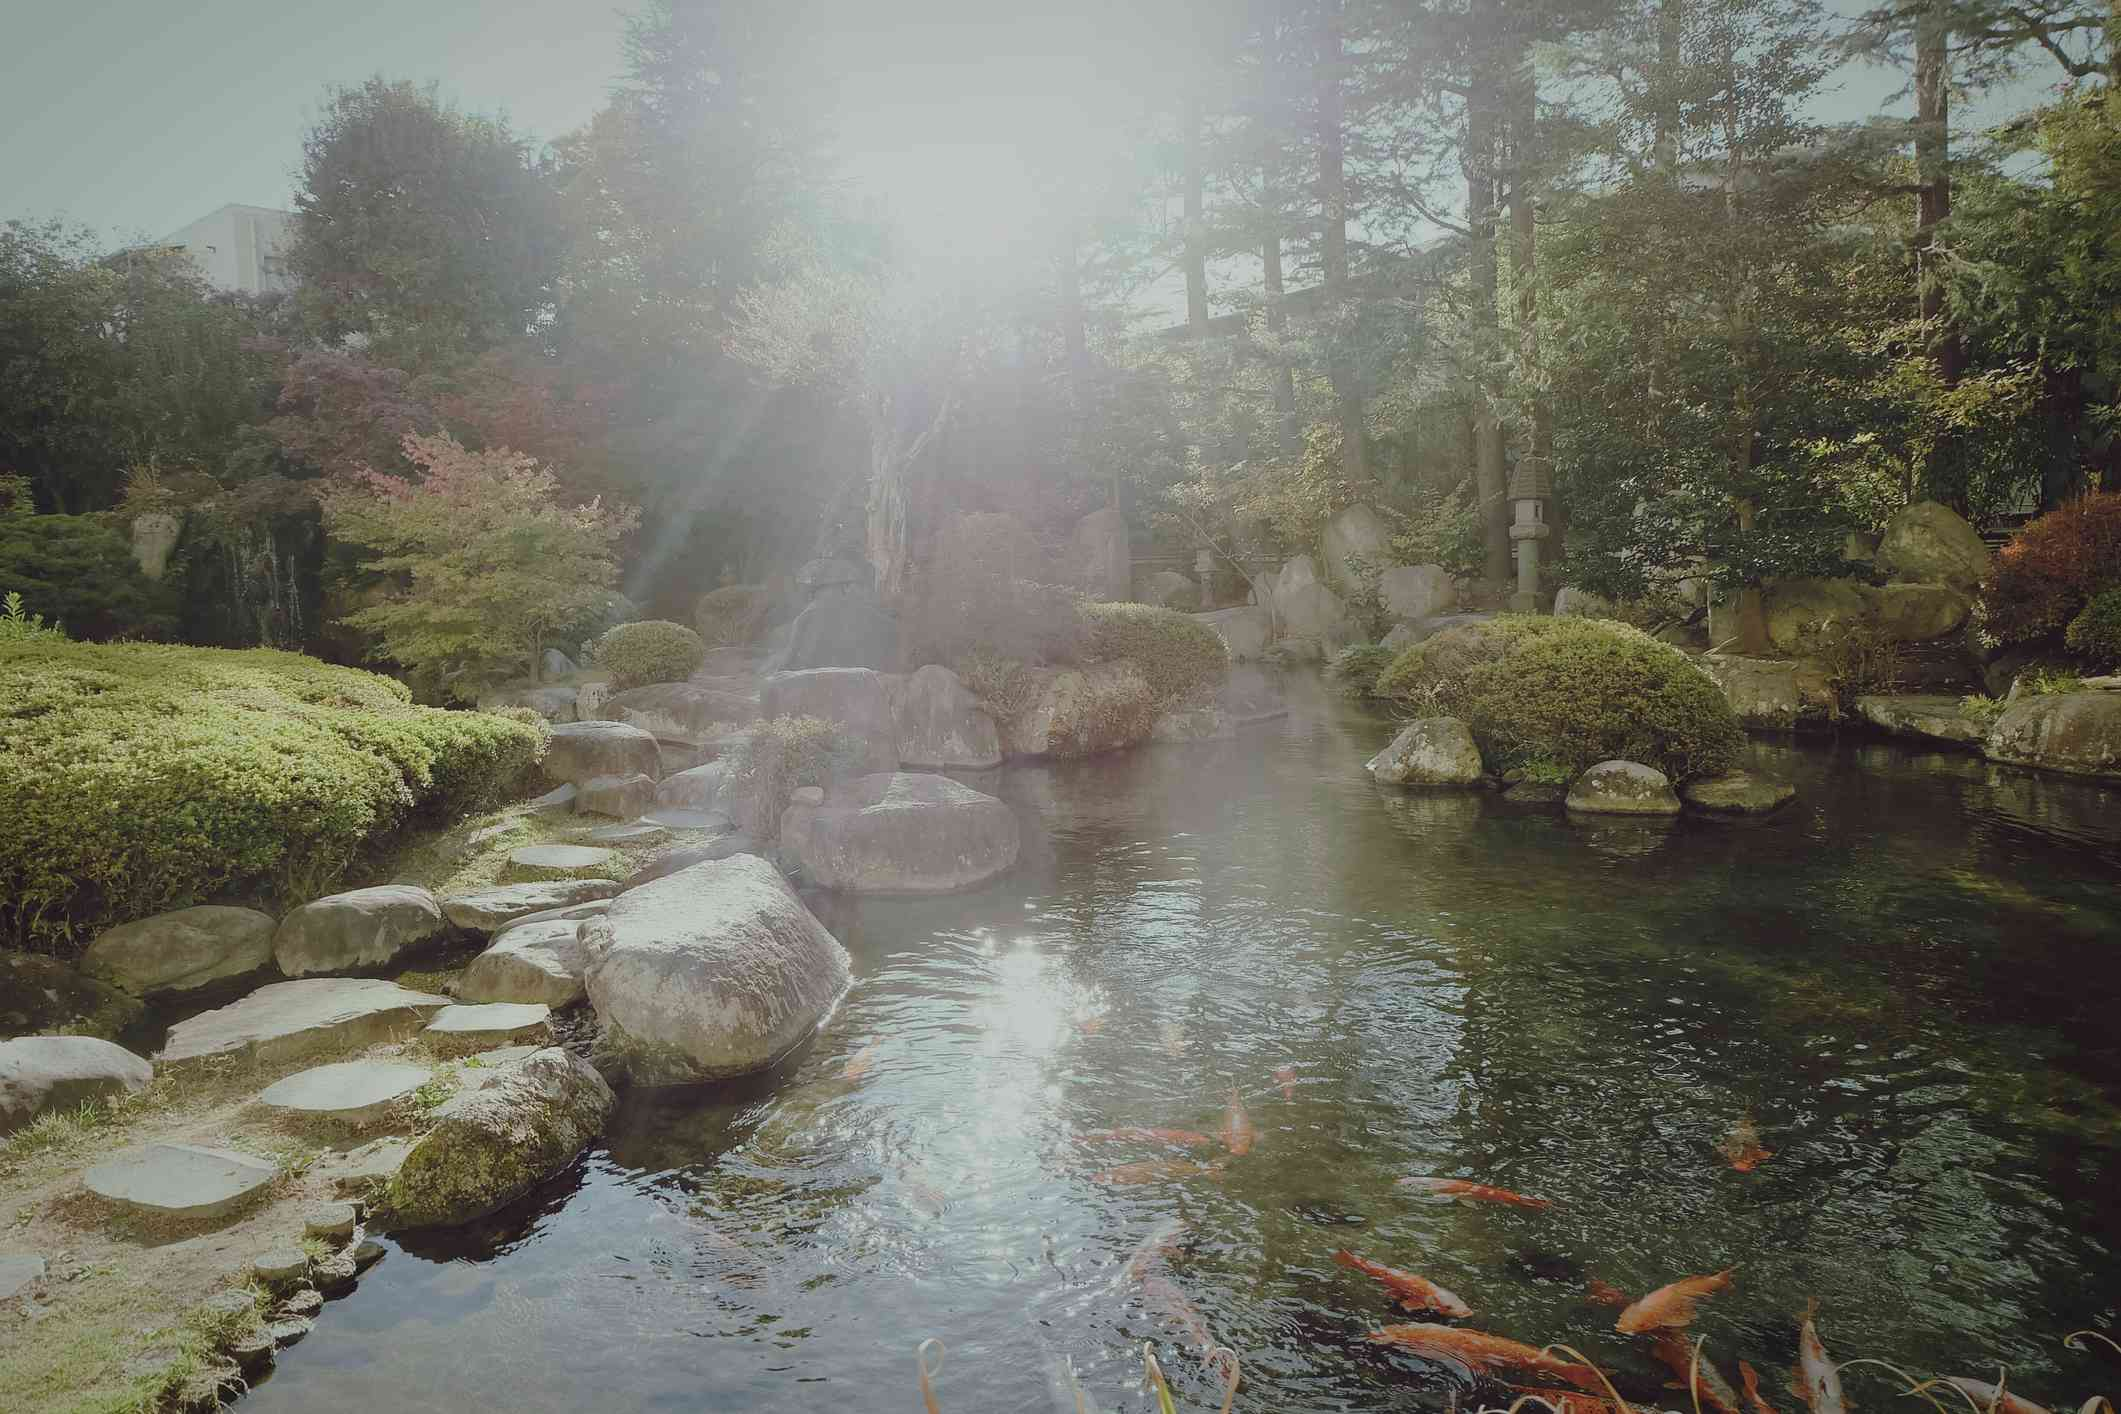 Koi pond bordered by rocks.